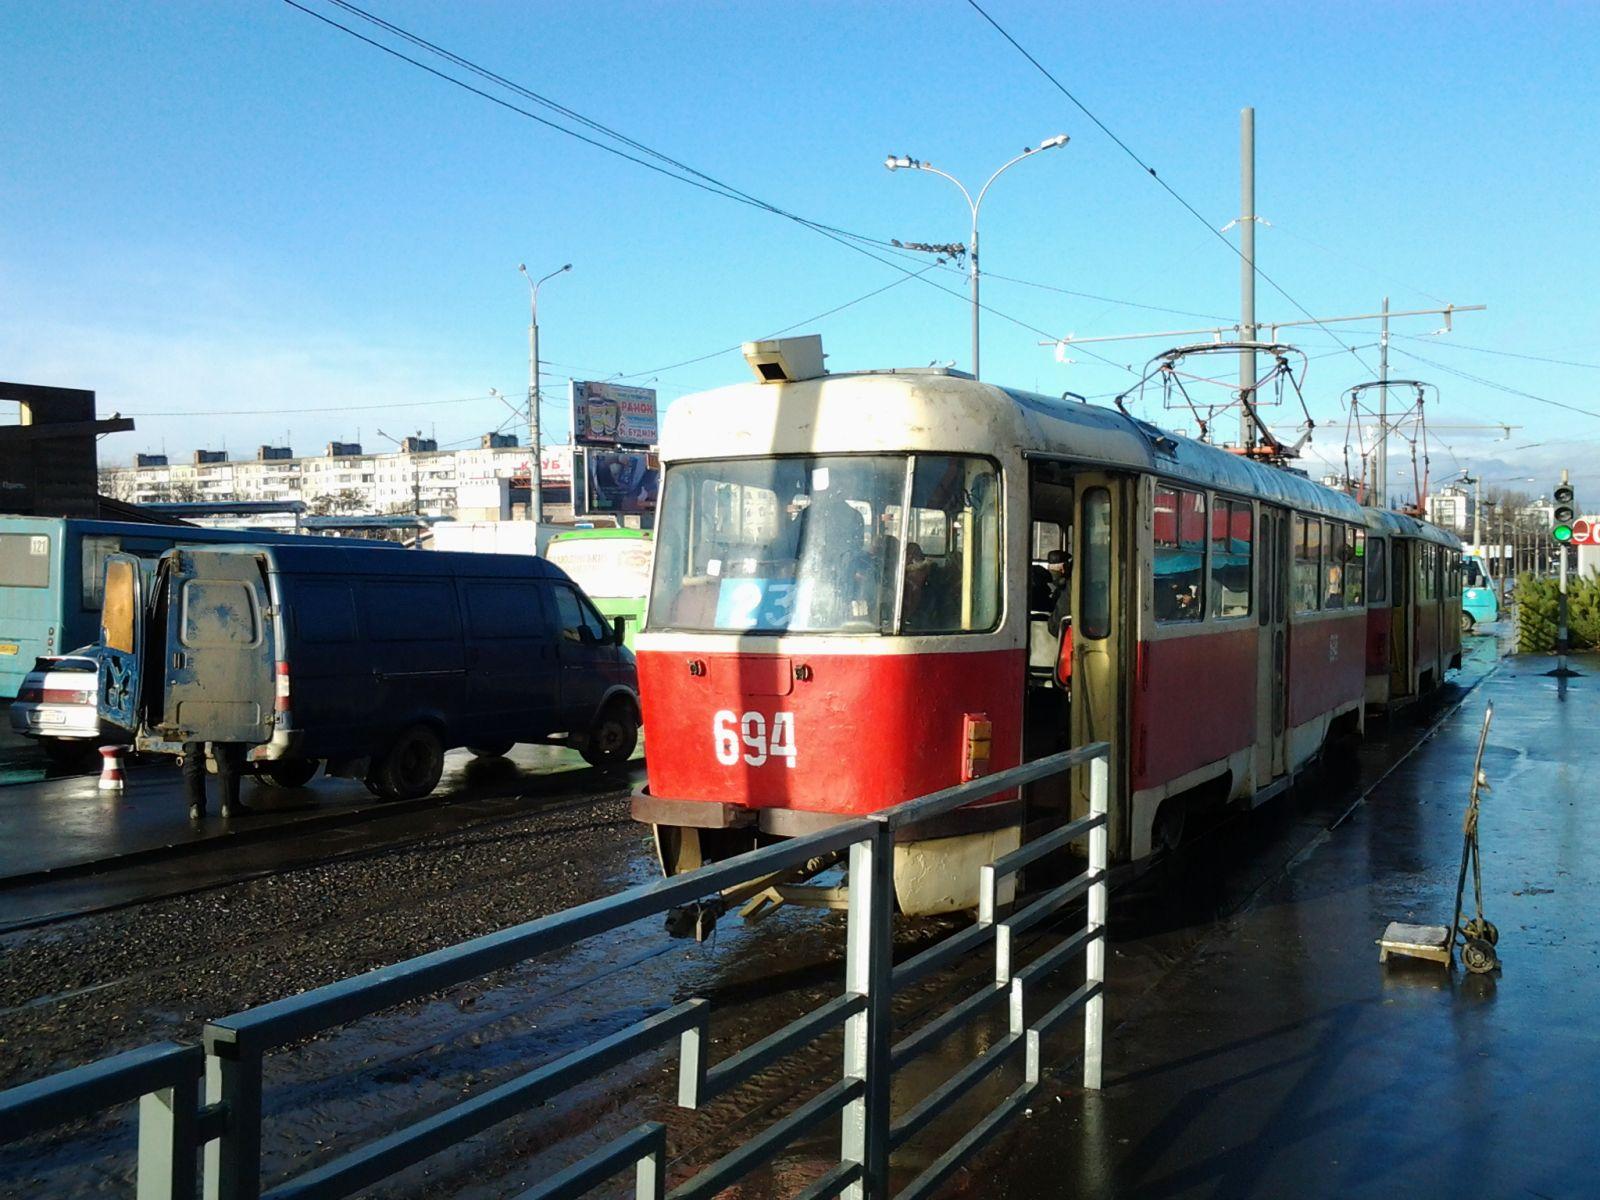 На трамвайной остановке в Харькове поймали преступника